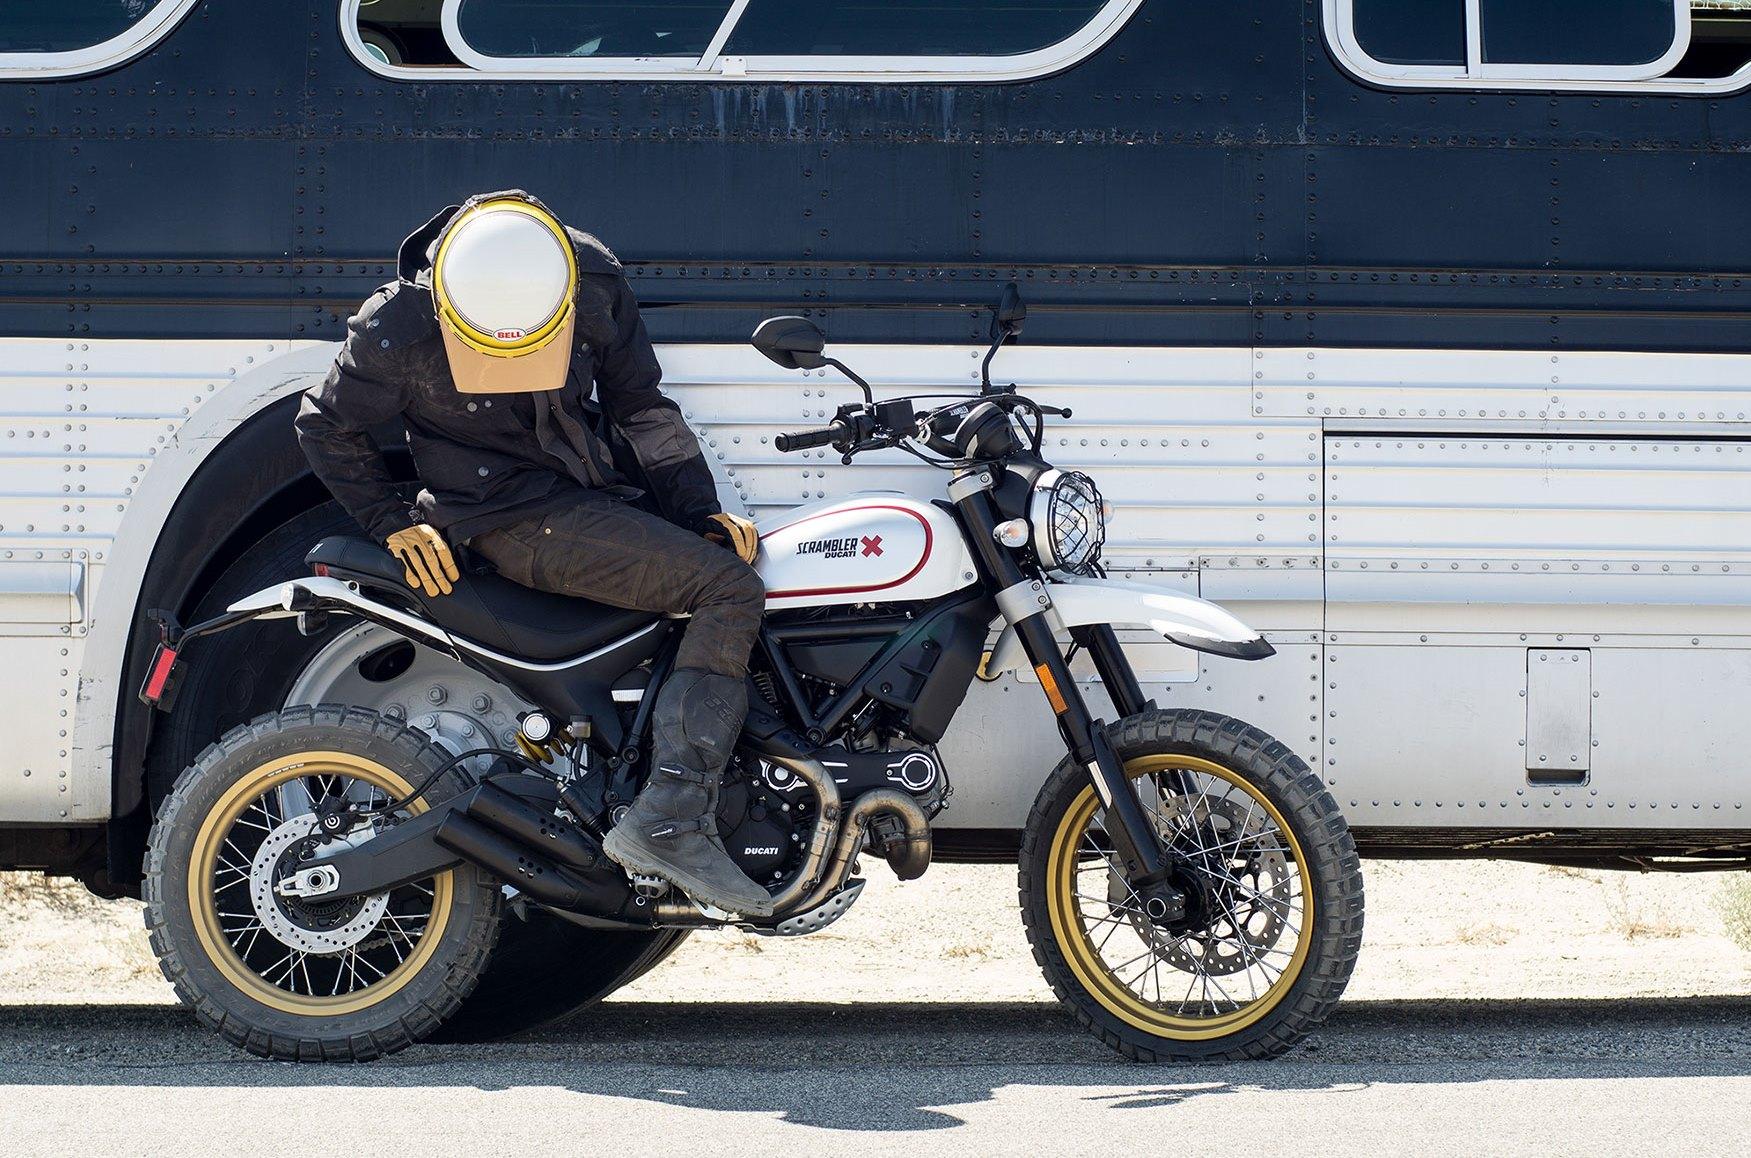 scrambler_desert_sled_ducati_motocyklicznie